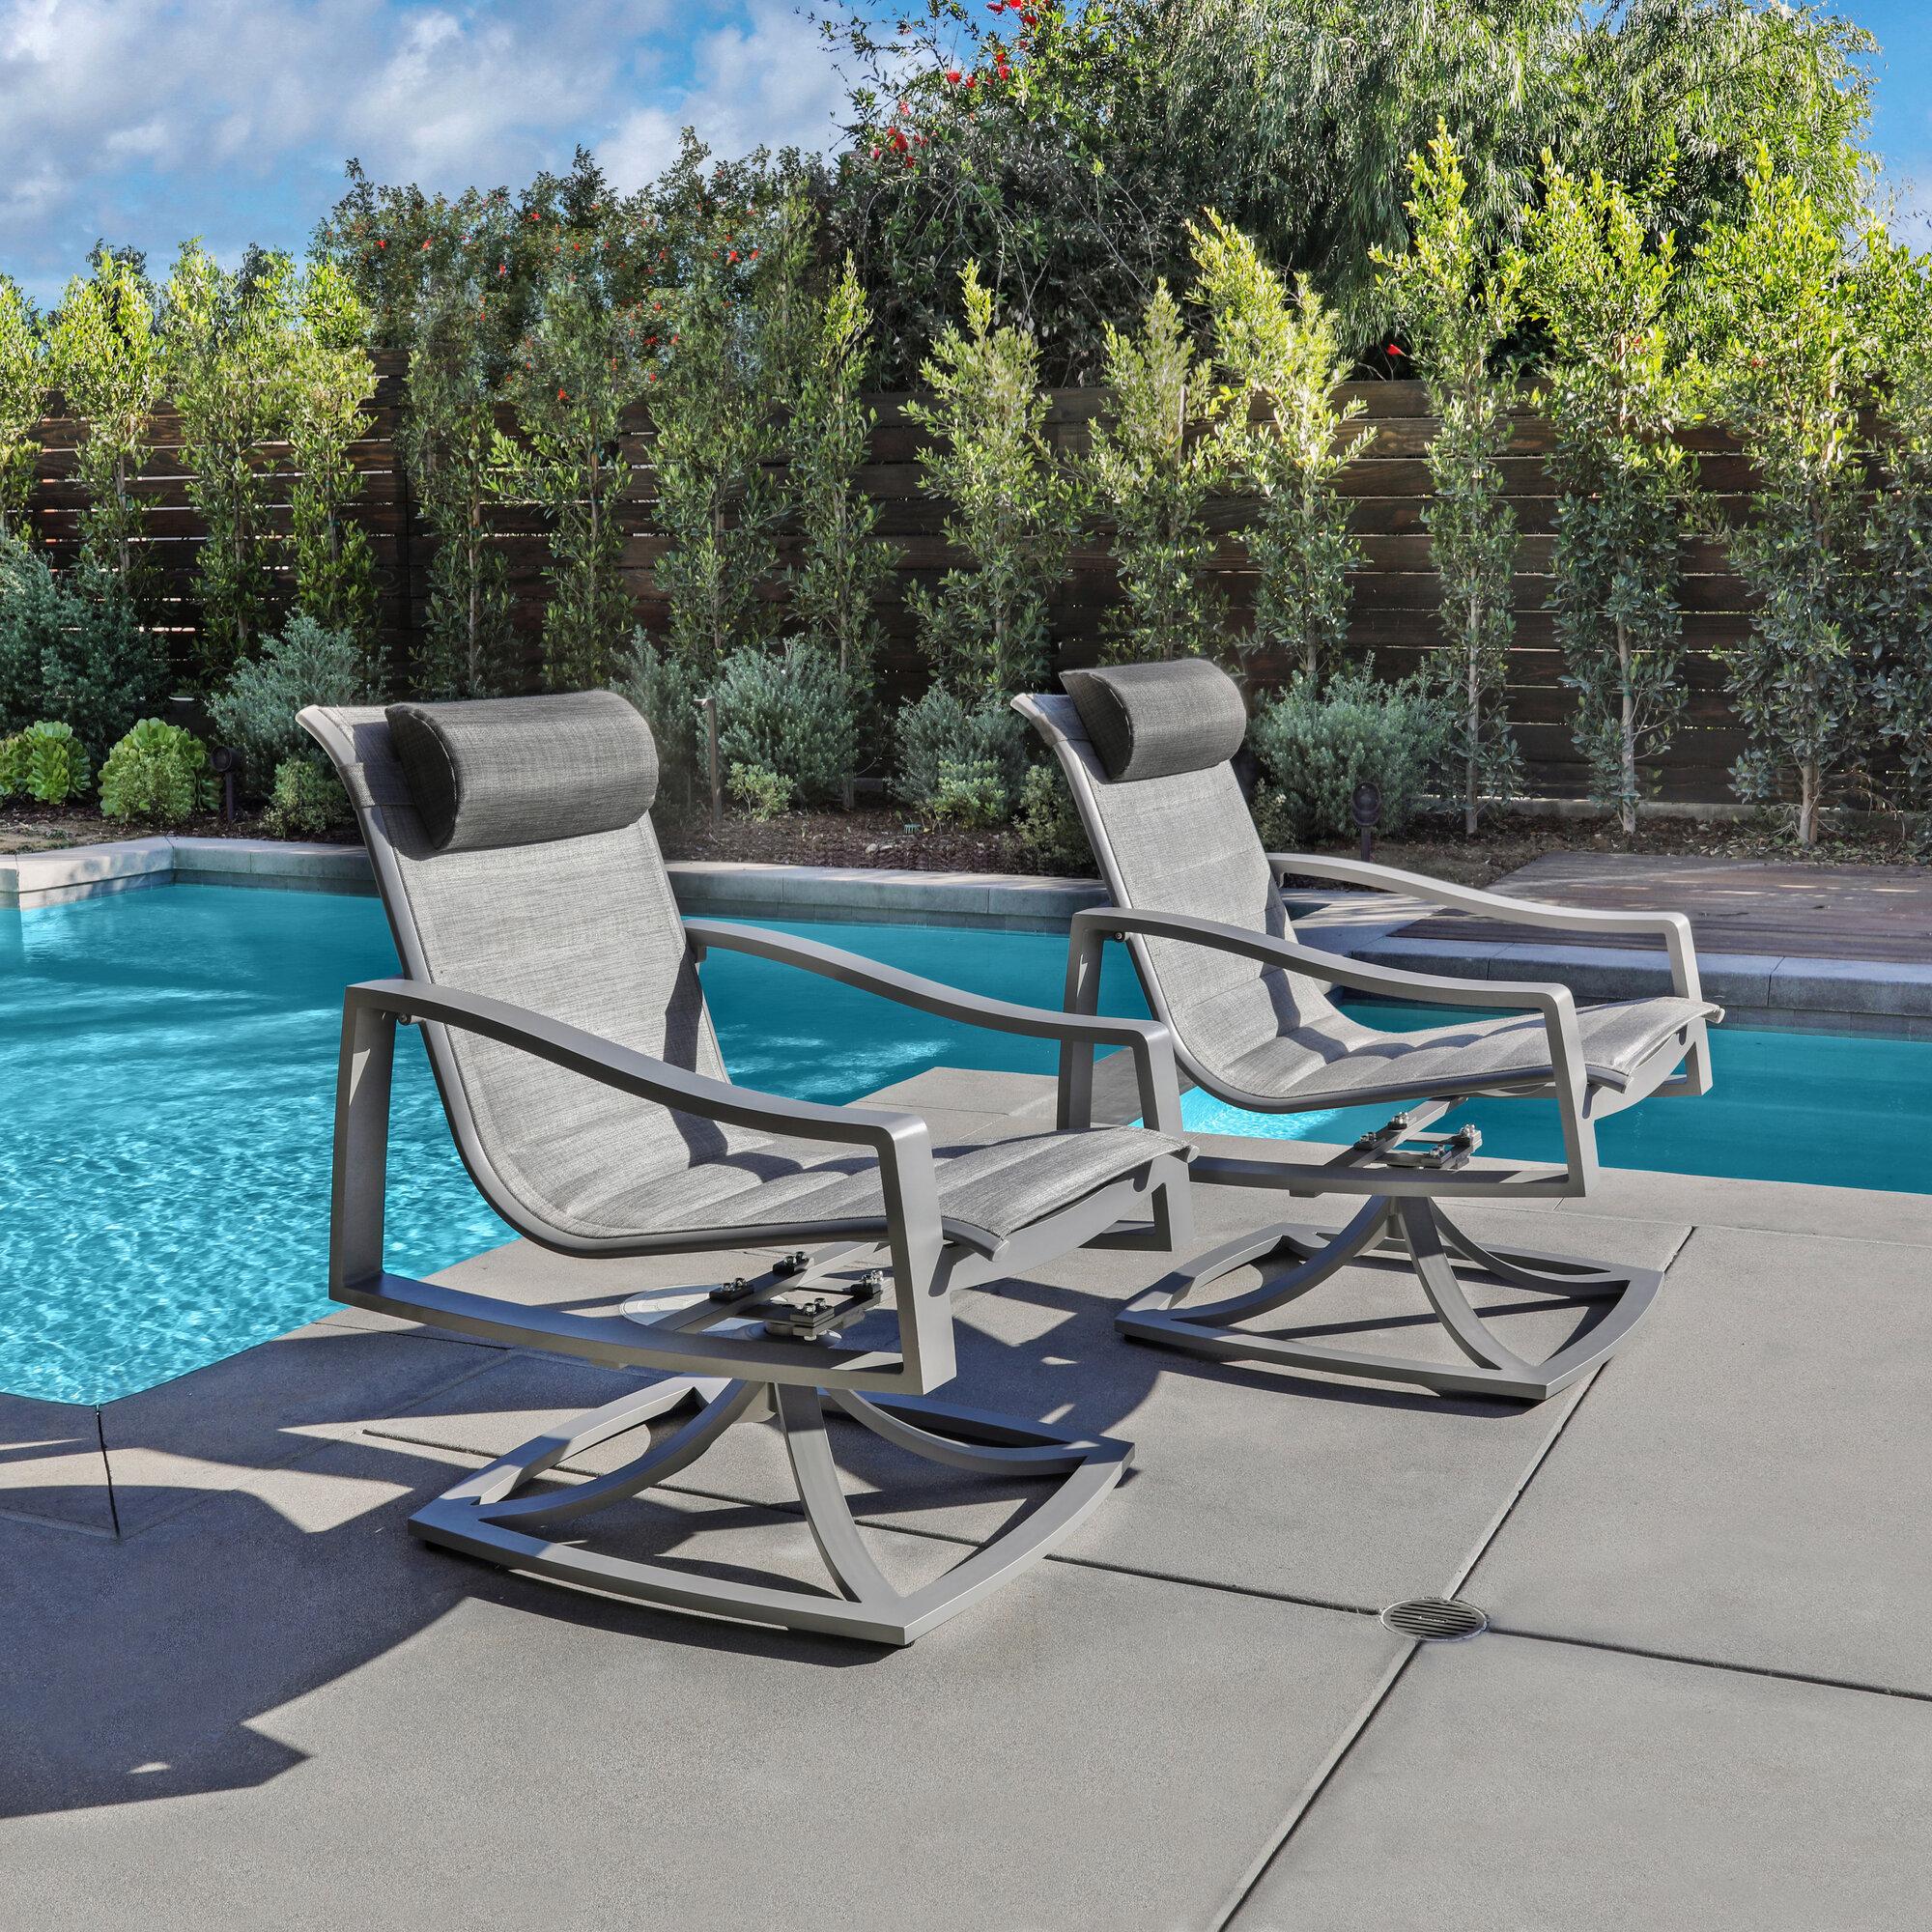 Image Is Loading Brayden Studio Shepha Patio Chair With Sunbrella Cushions